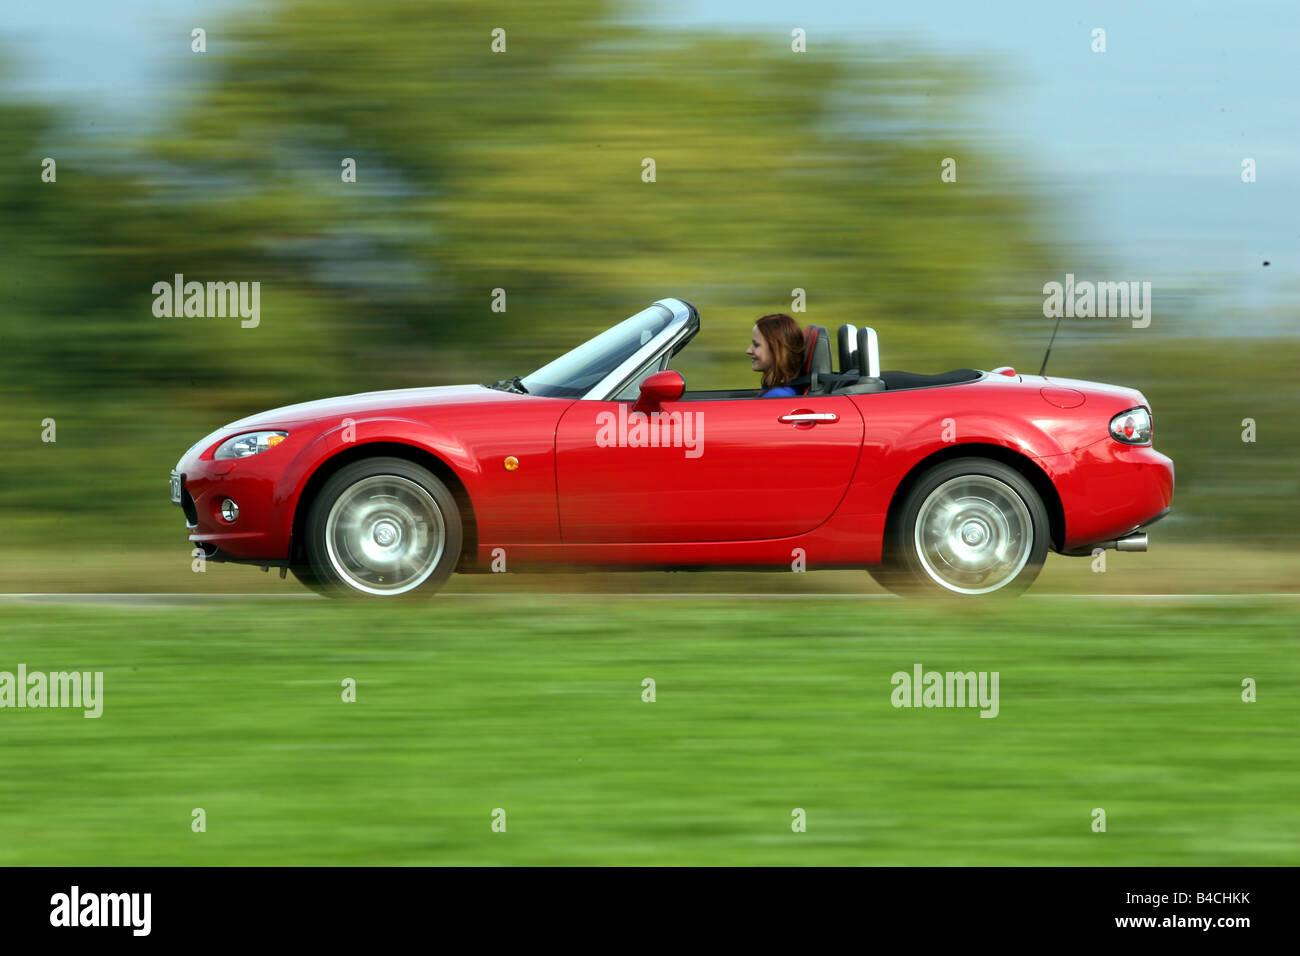 Kelebihan Mazda Mx5 2005 Review